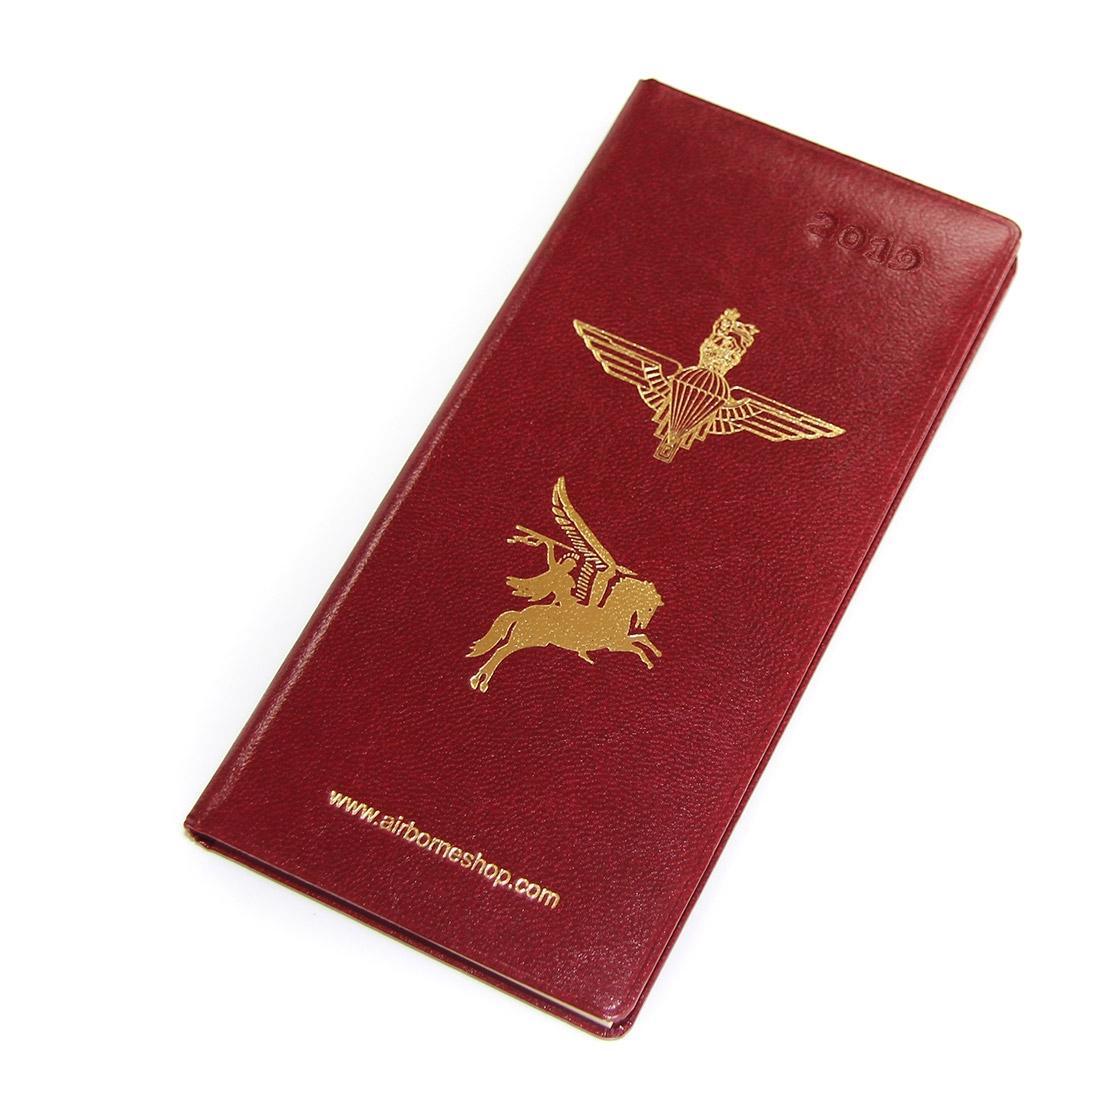 2019 Para & Pegasus Pocket Diary